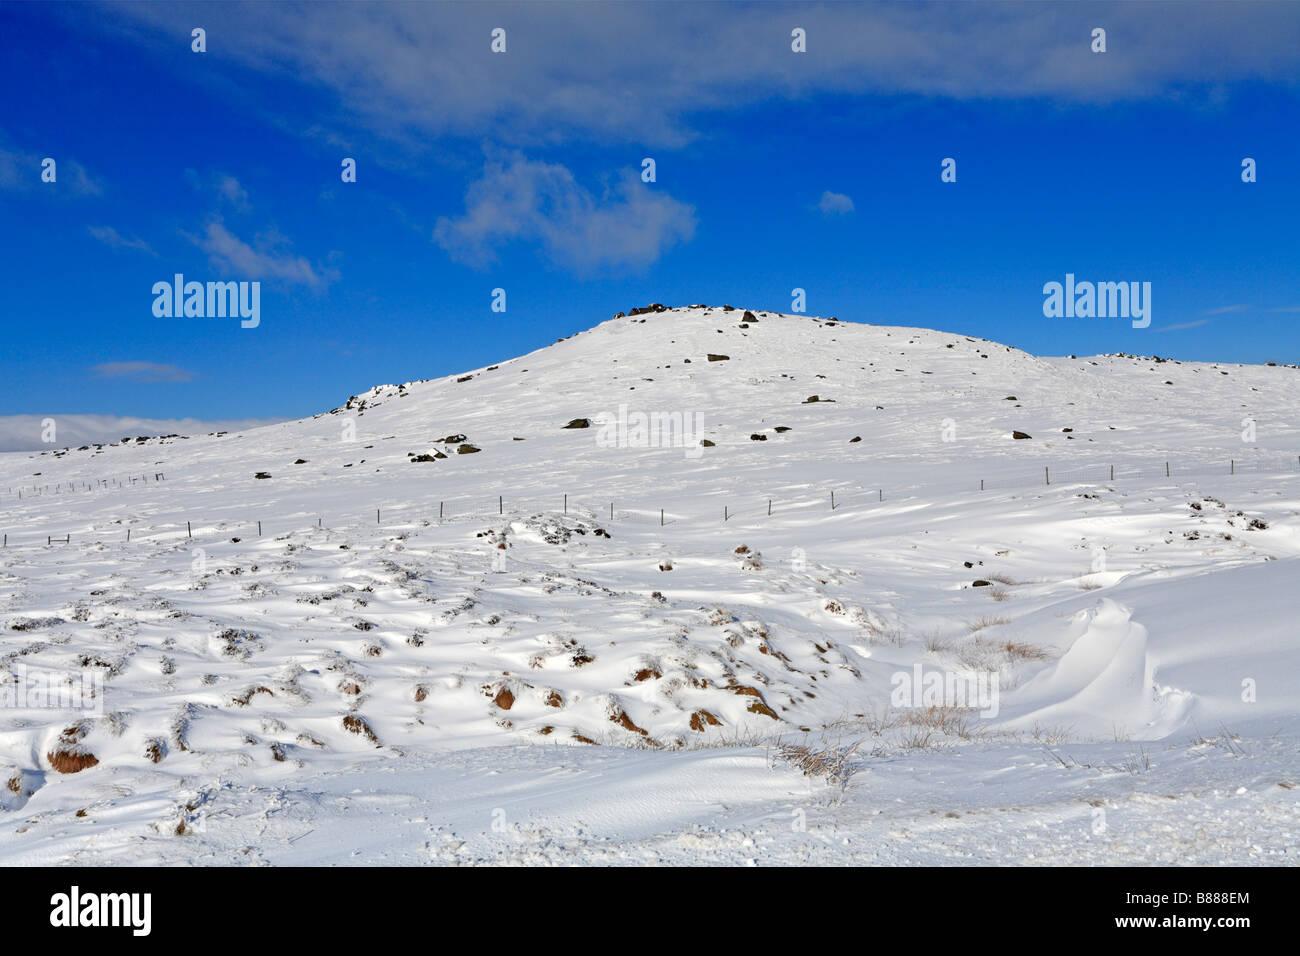 Winter on West Nab, Meltham Moor near Holmfirth, West Yorkshire, Peak District National Park, England, UK. - Stock Image